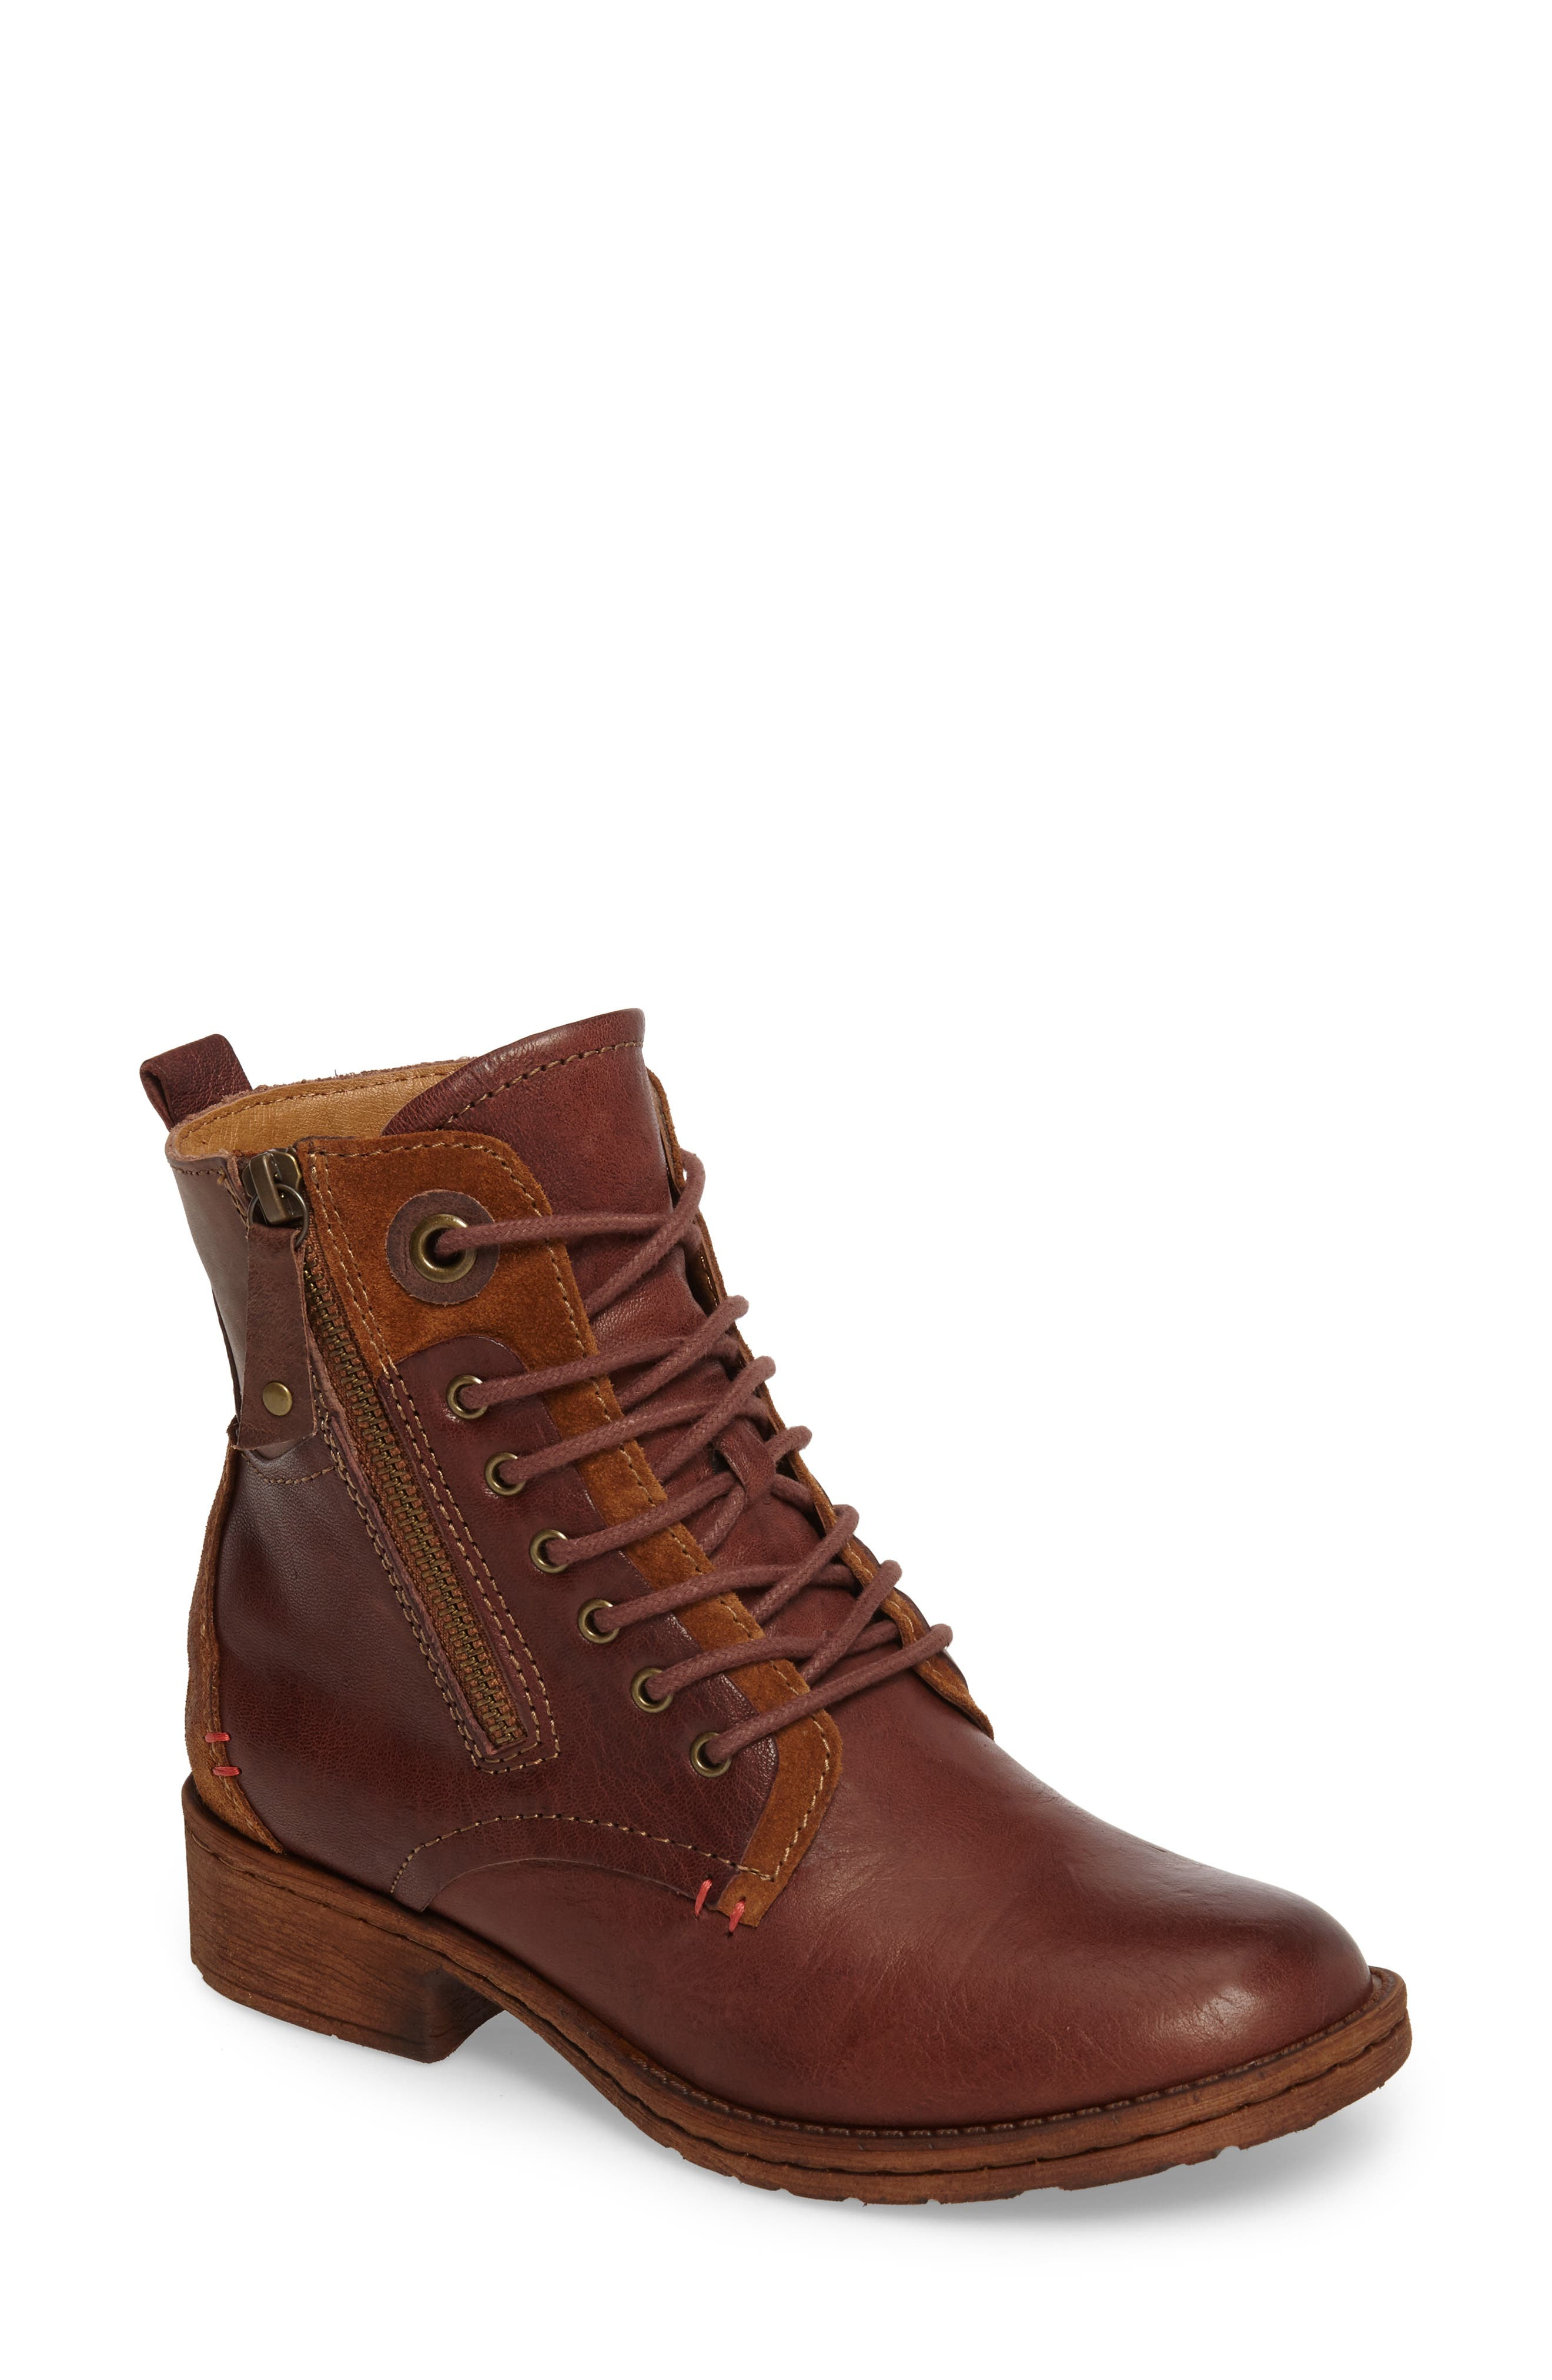 Main Image - Comfortiva Sarango Lace-Up Boot (Women)